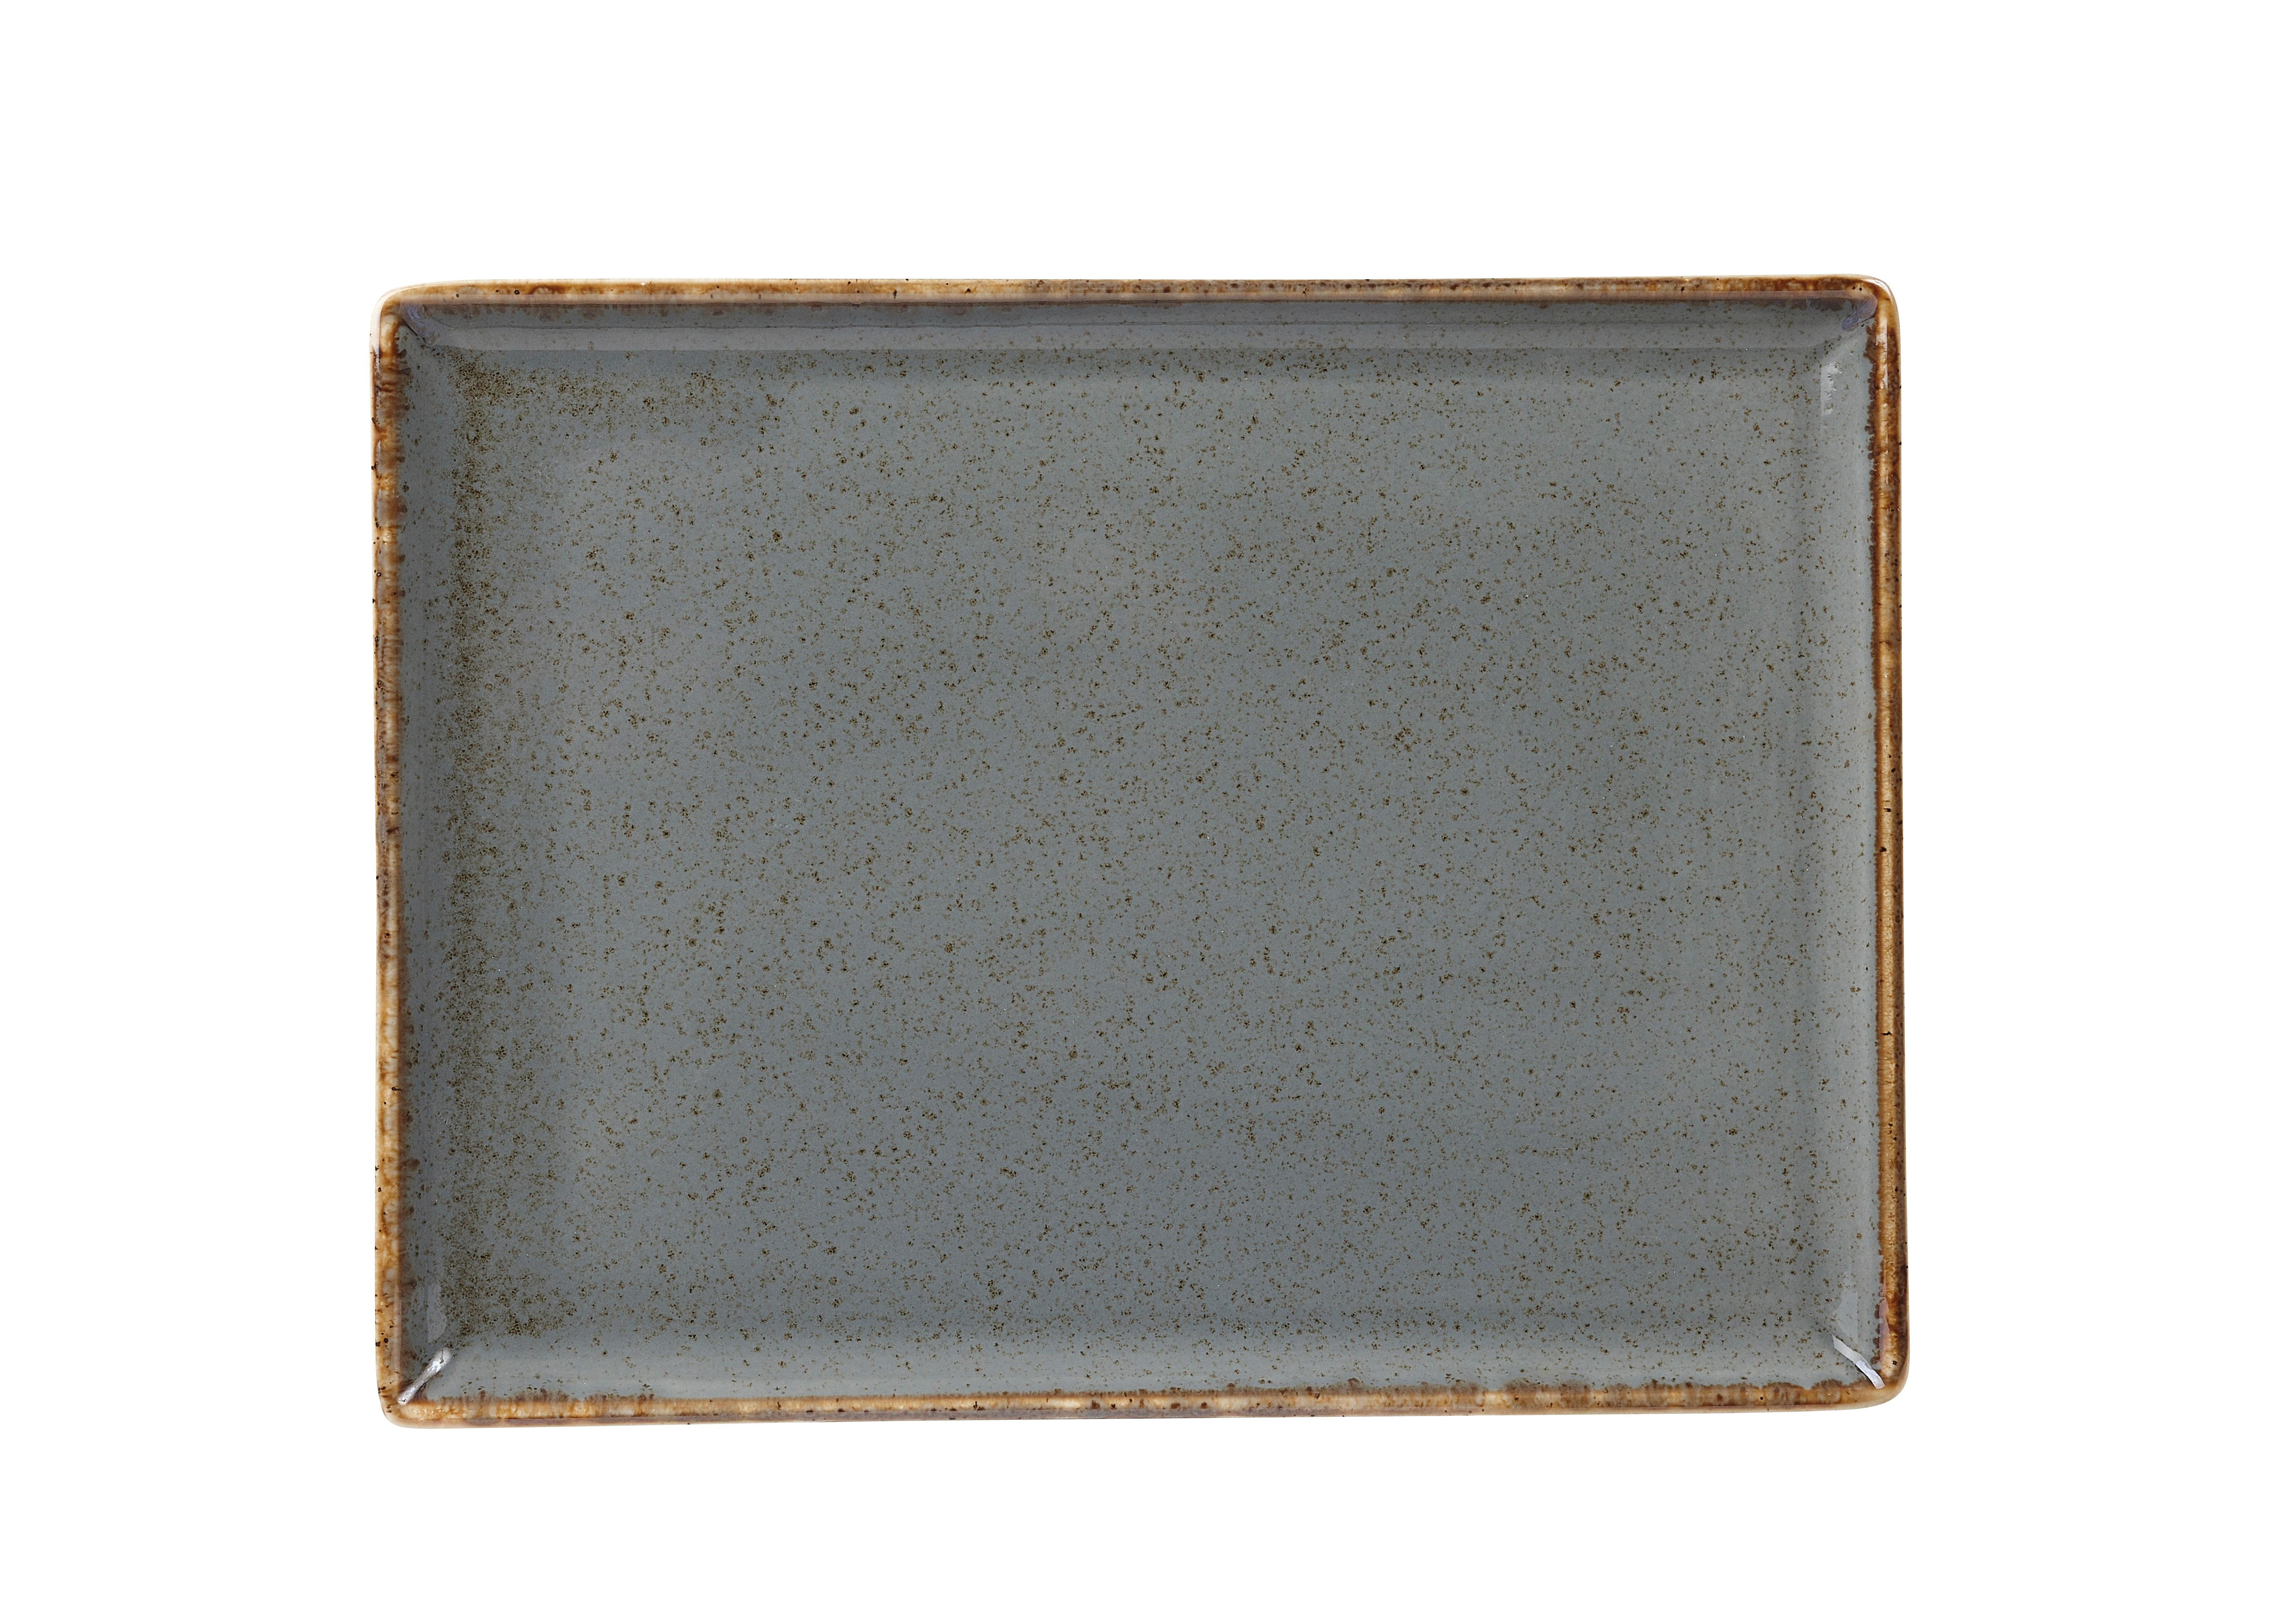 "Tormenta rectangular Plato de 27x20cm / 10.75x8.25"""